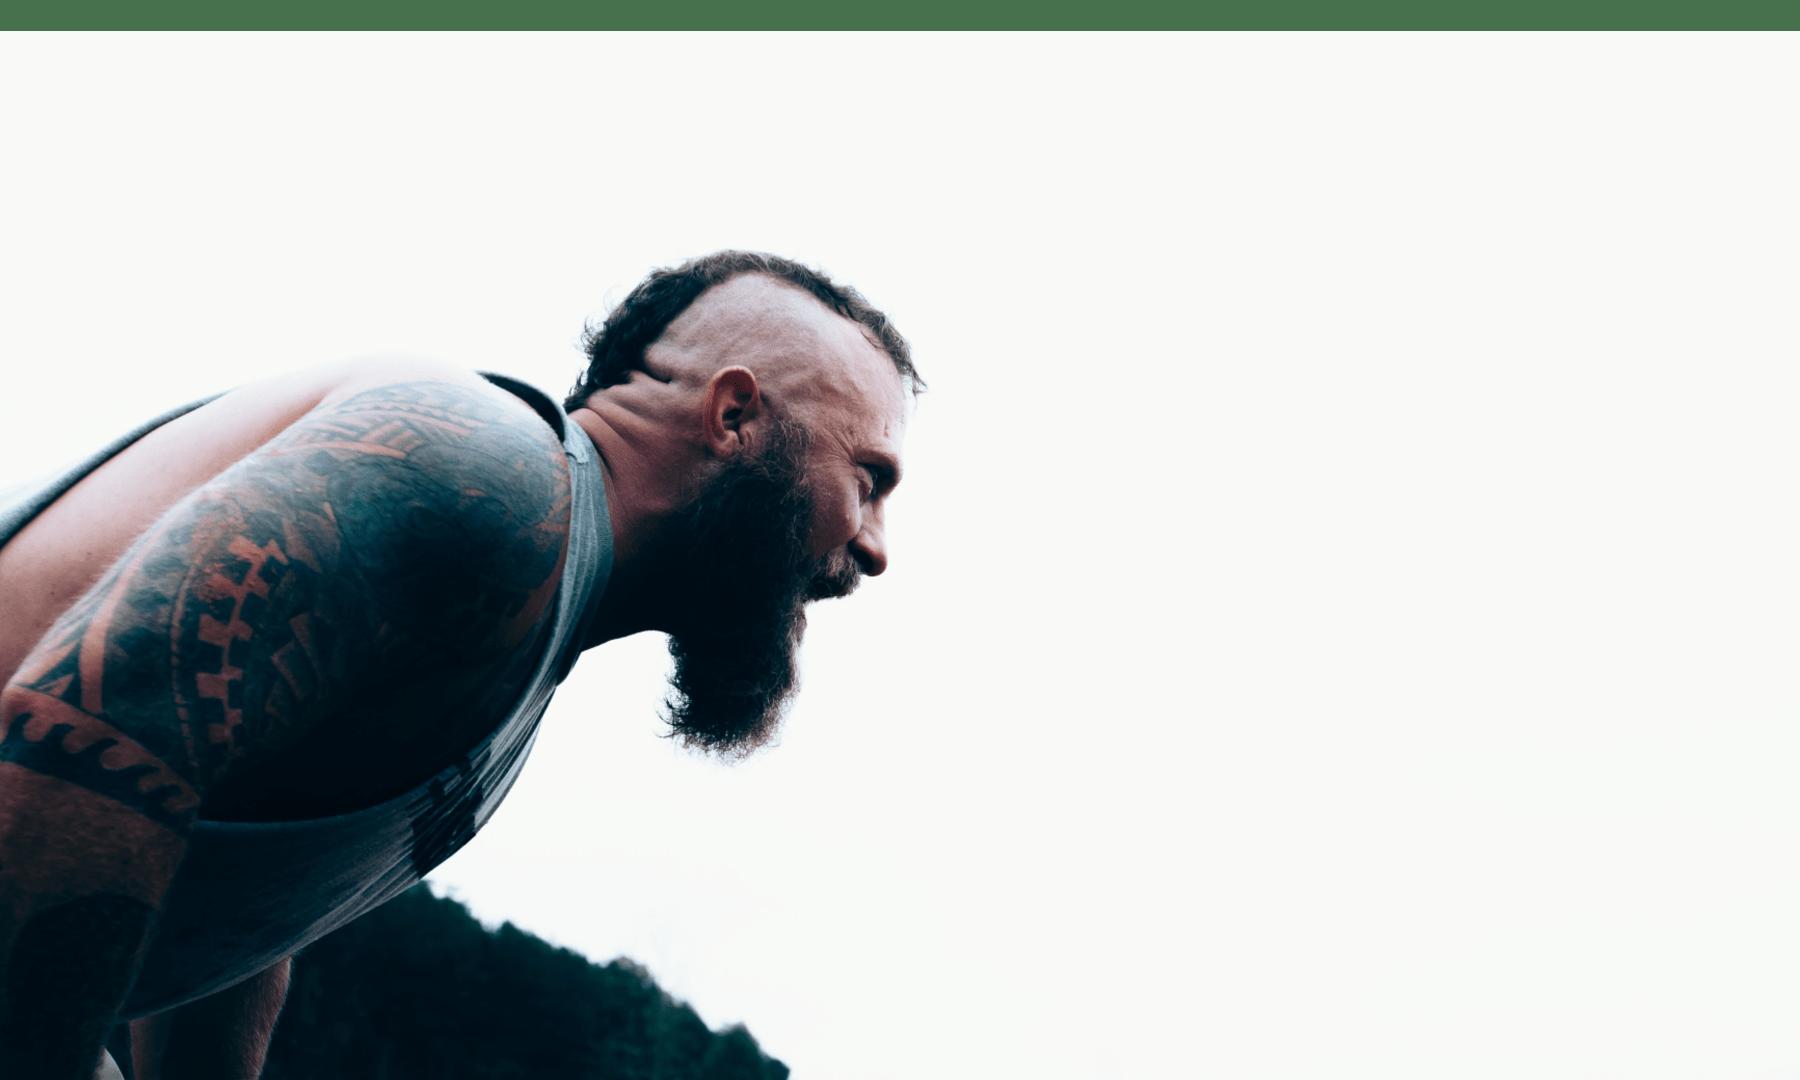 Do Vegan Athletes Have an Edge? Benefits of Being a Vegan Athlete